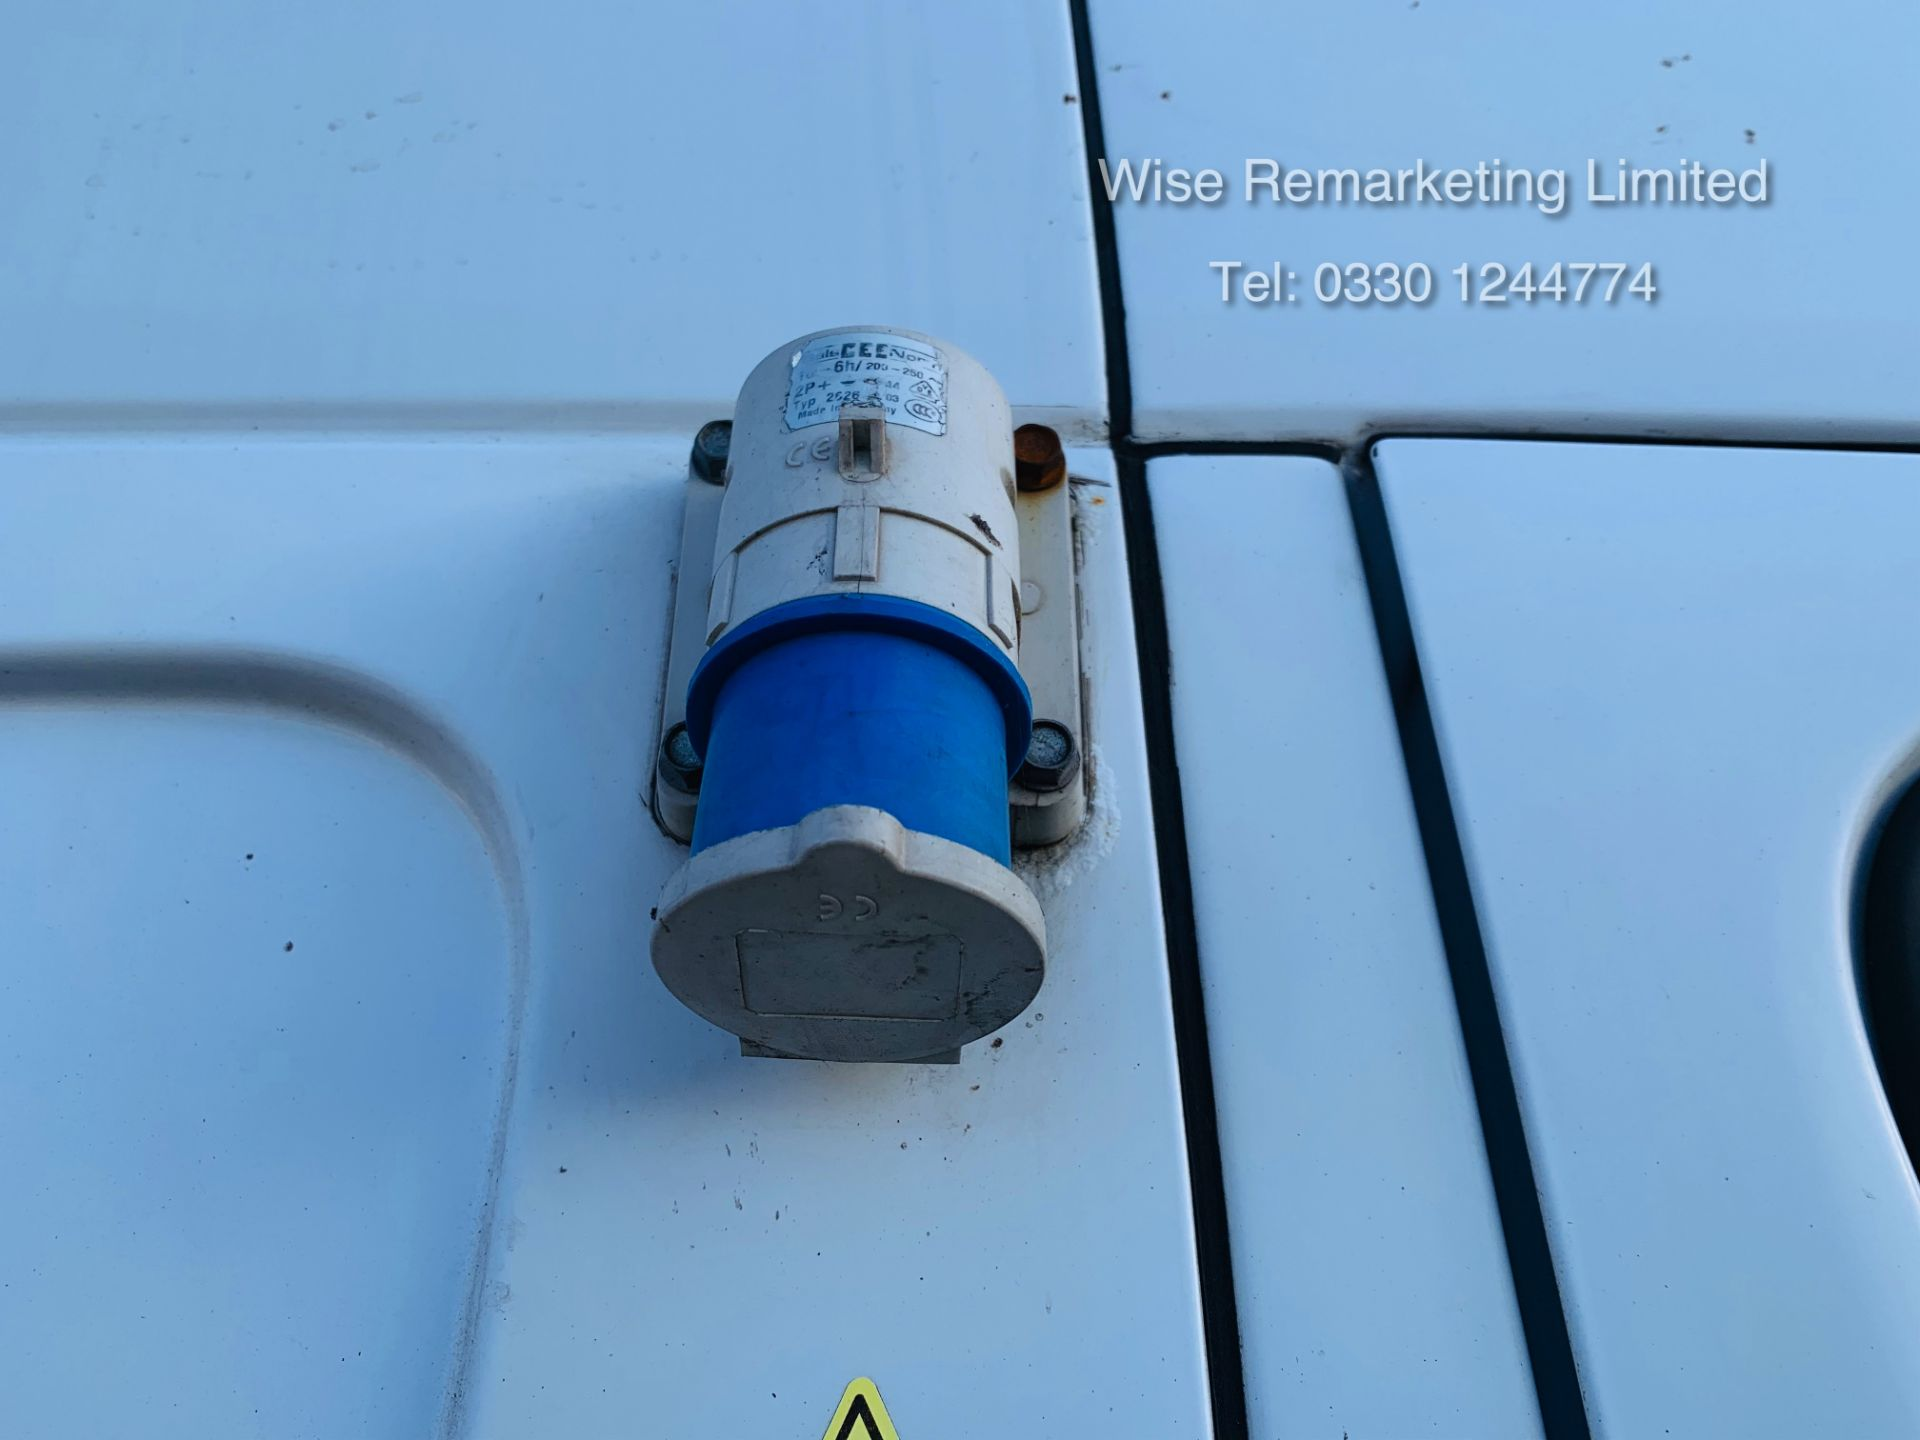 Lot 12 - Mercedes Sprinter 316 2.1 CDI Long Wheel Base Fridge/Freezer Overnight Standby Van - 2014 Model